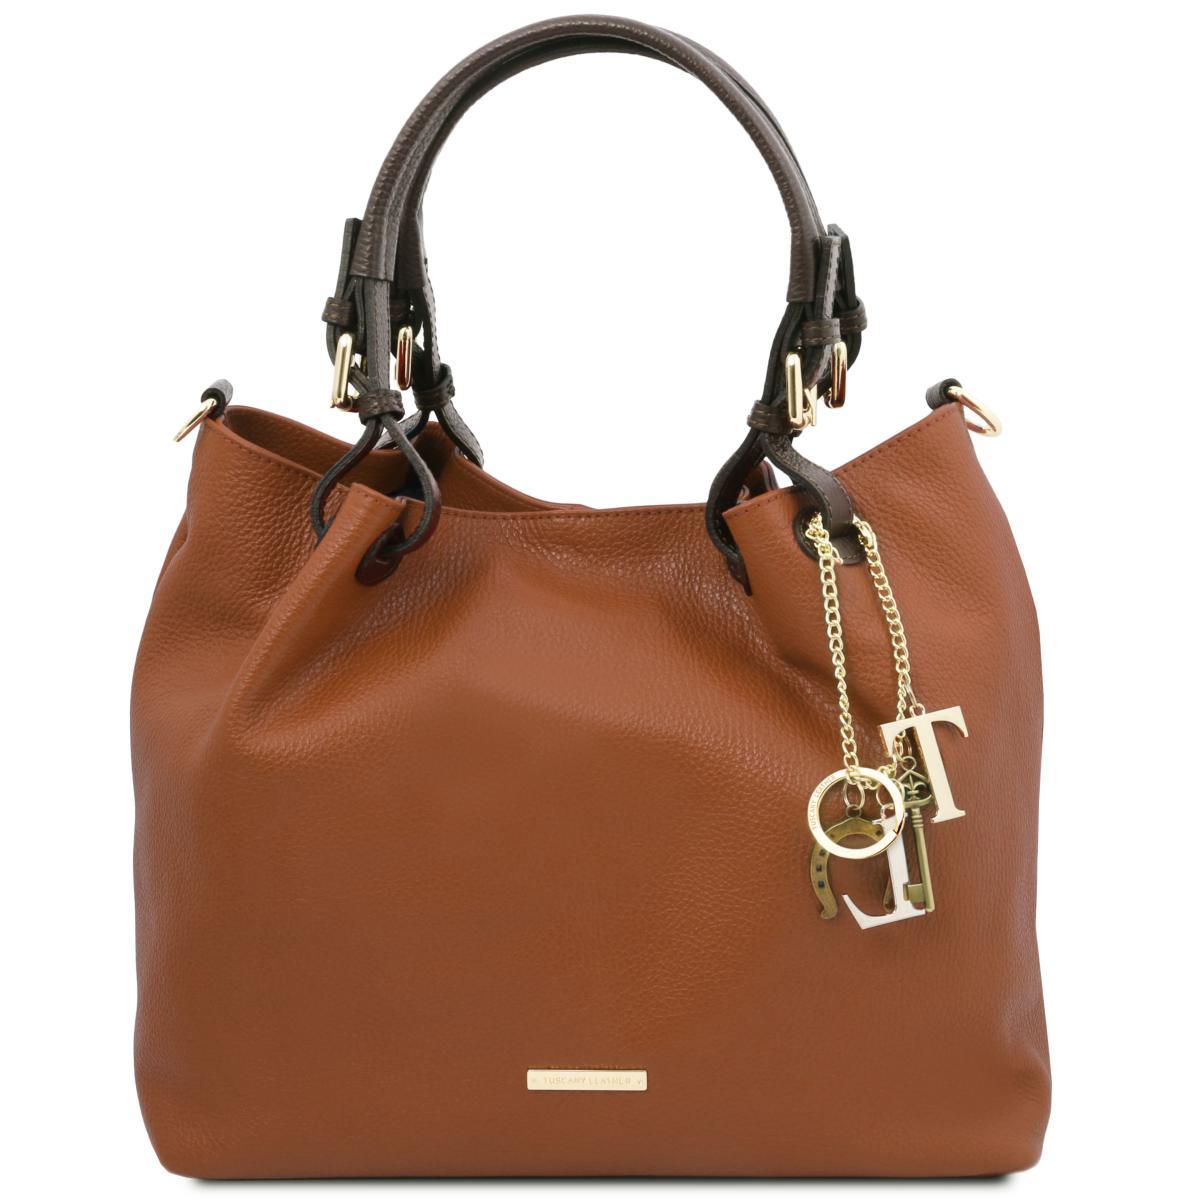 sac fourre tout cuir souple femme tuscany leather